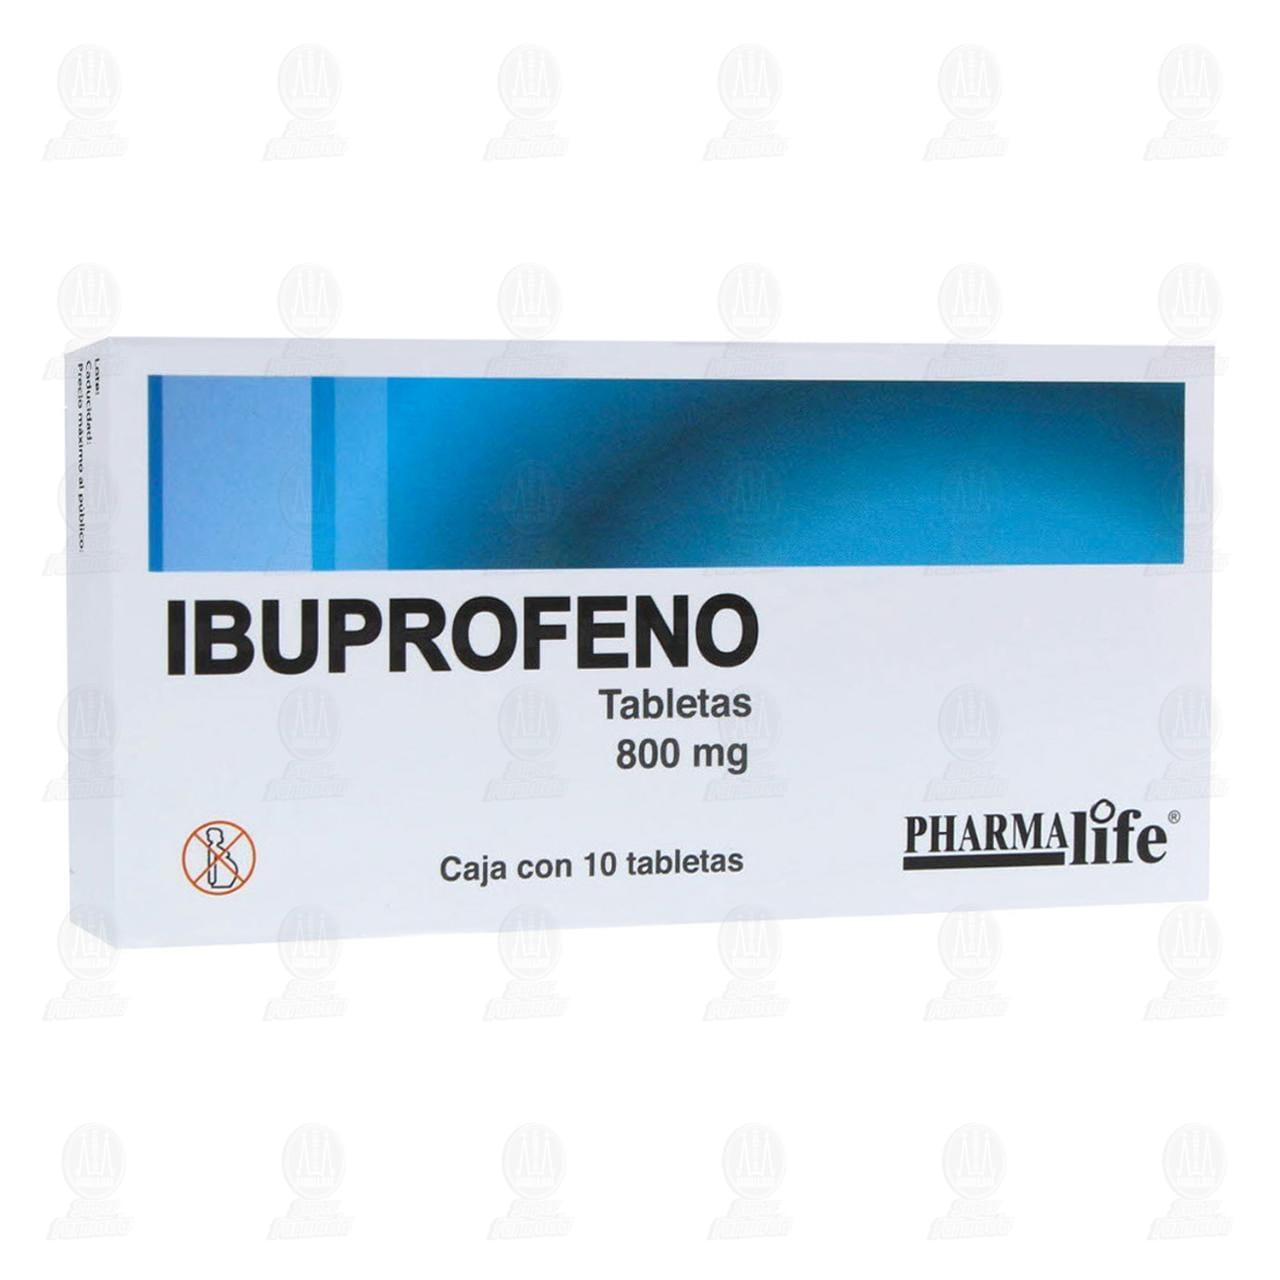 Comprar Ibuprofeno 800mg 10 Tabletas Pharmalife en Farmacias Guadalajara